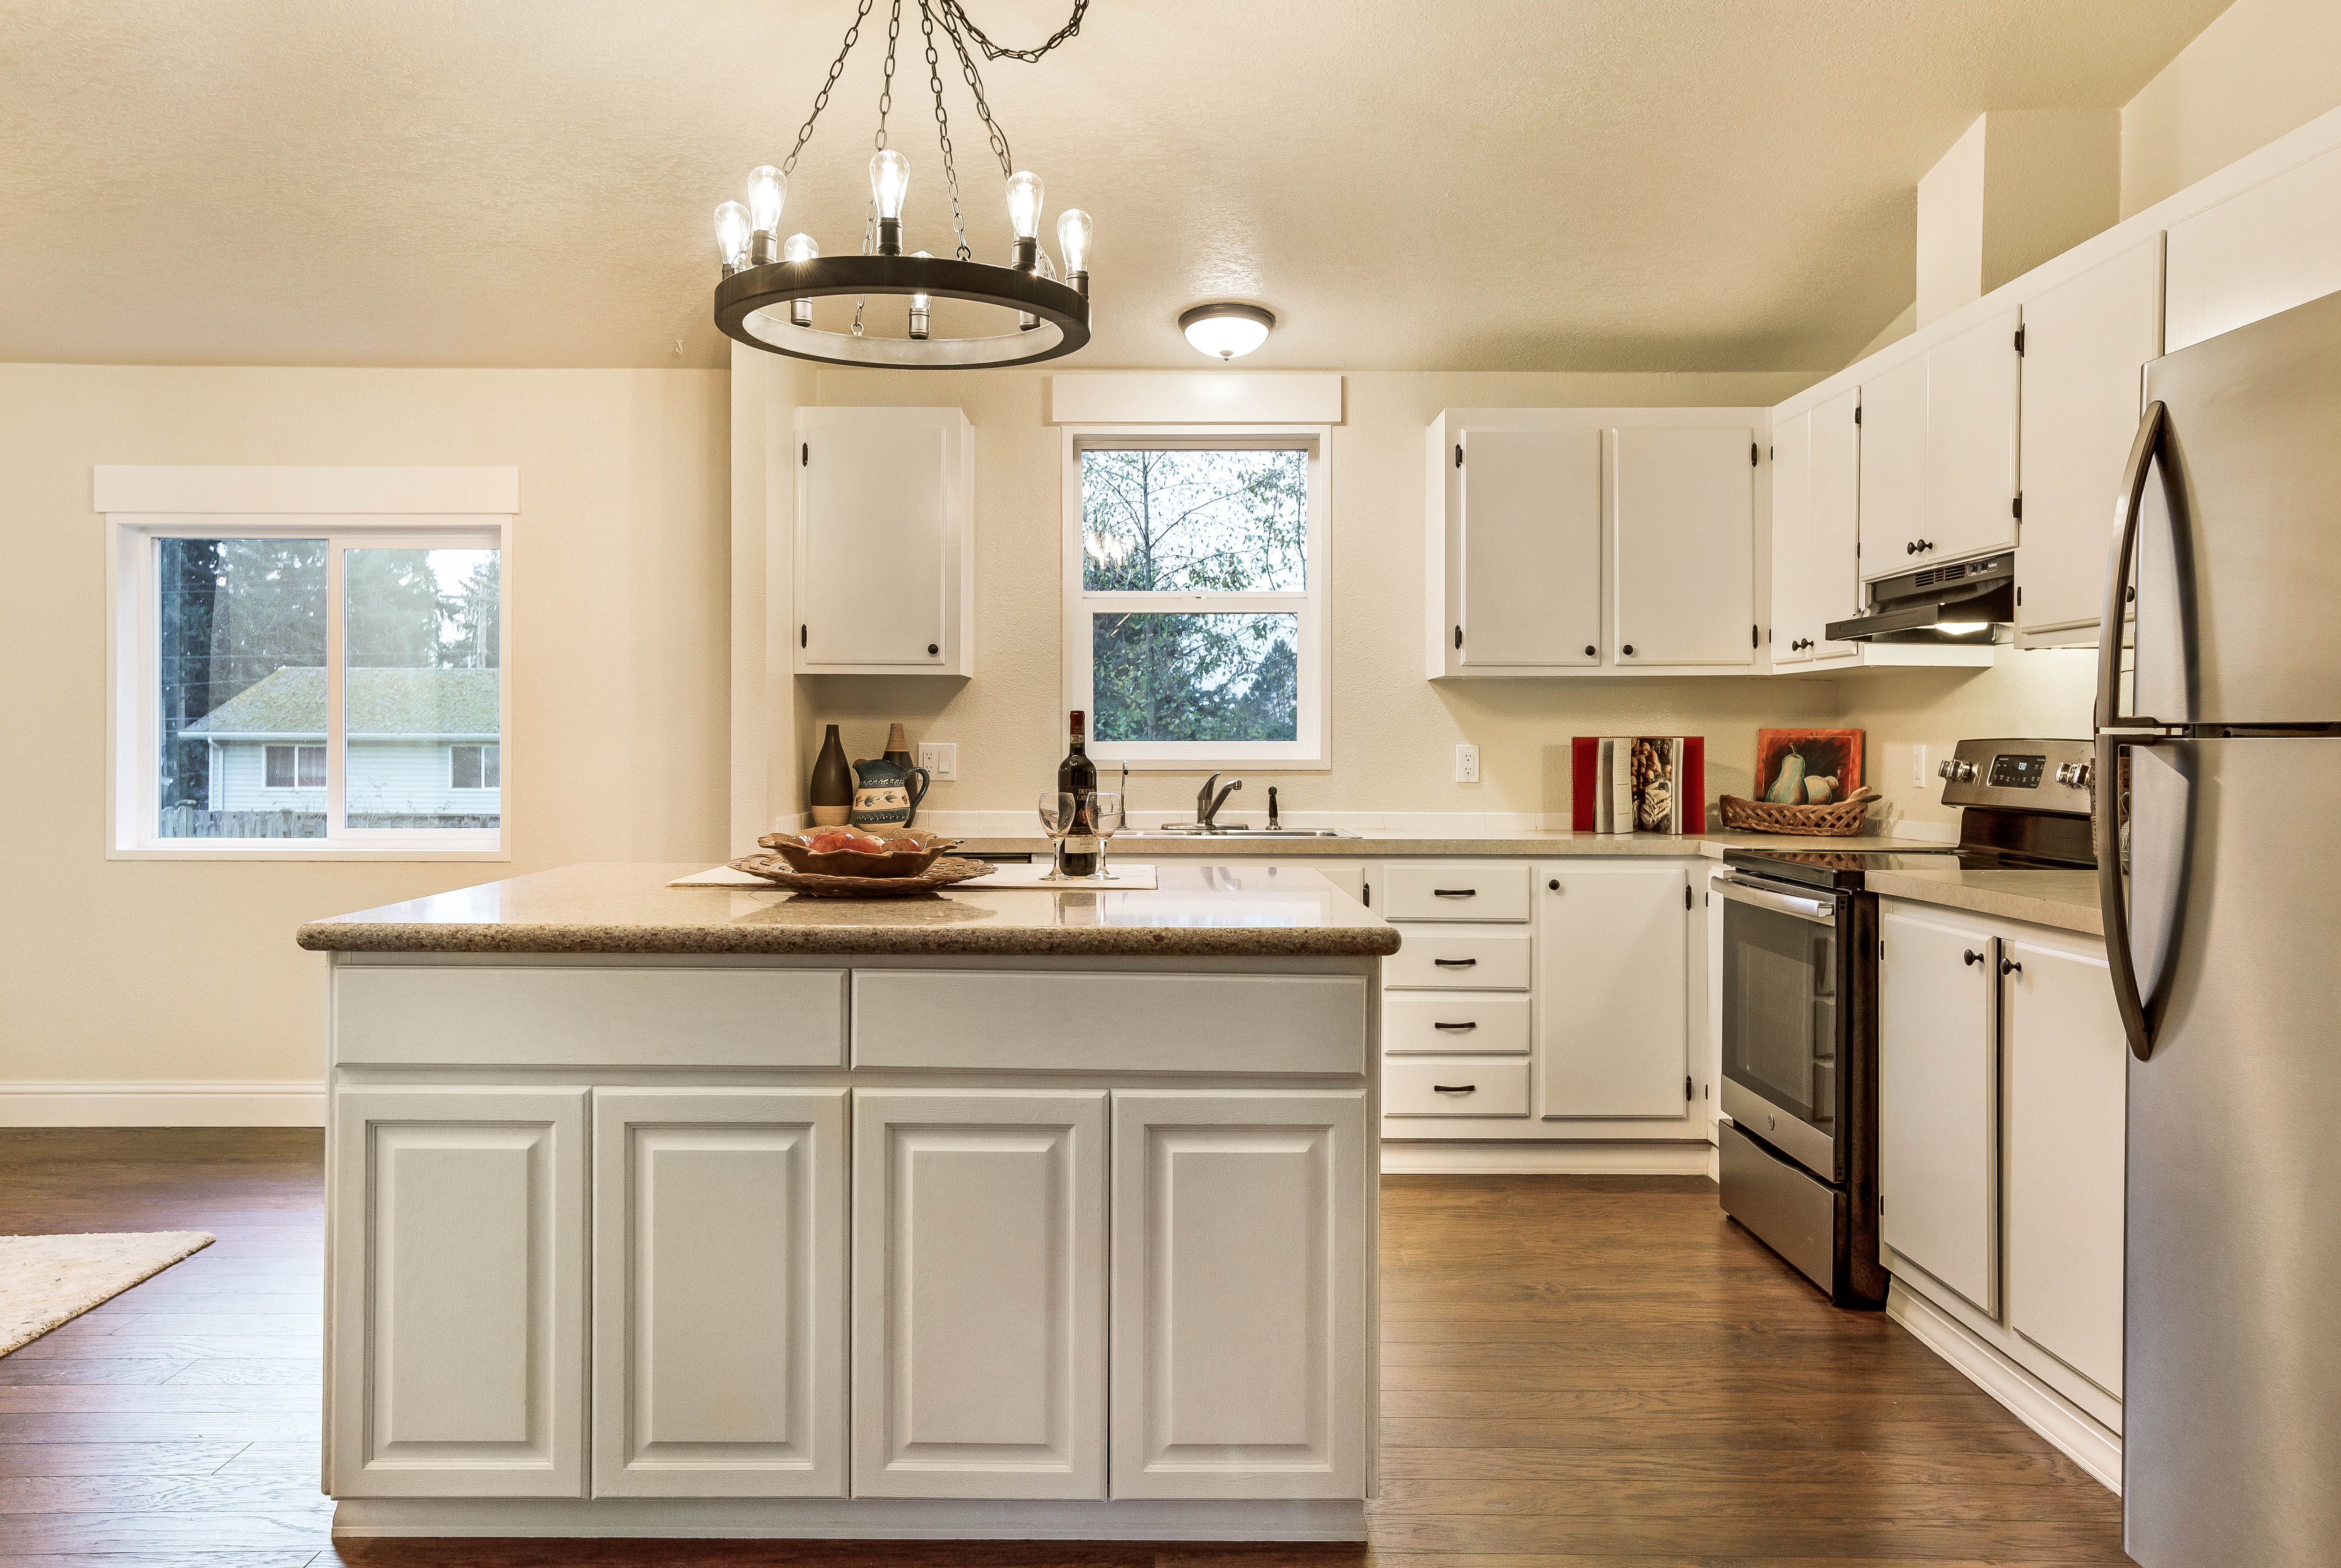 Kitchen, Kitchen design, Oak Harbor, Whidbey Island, Anita Johnston, Real estate